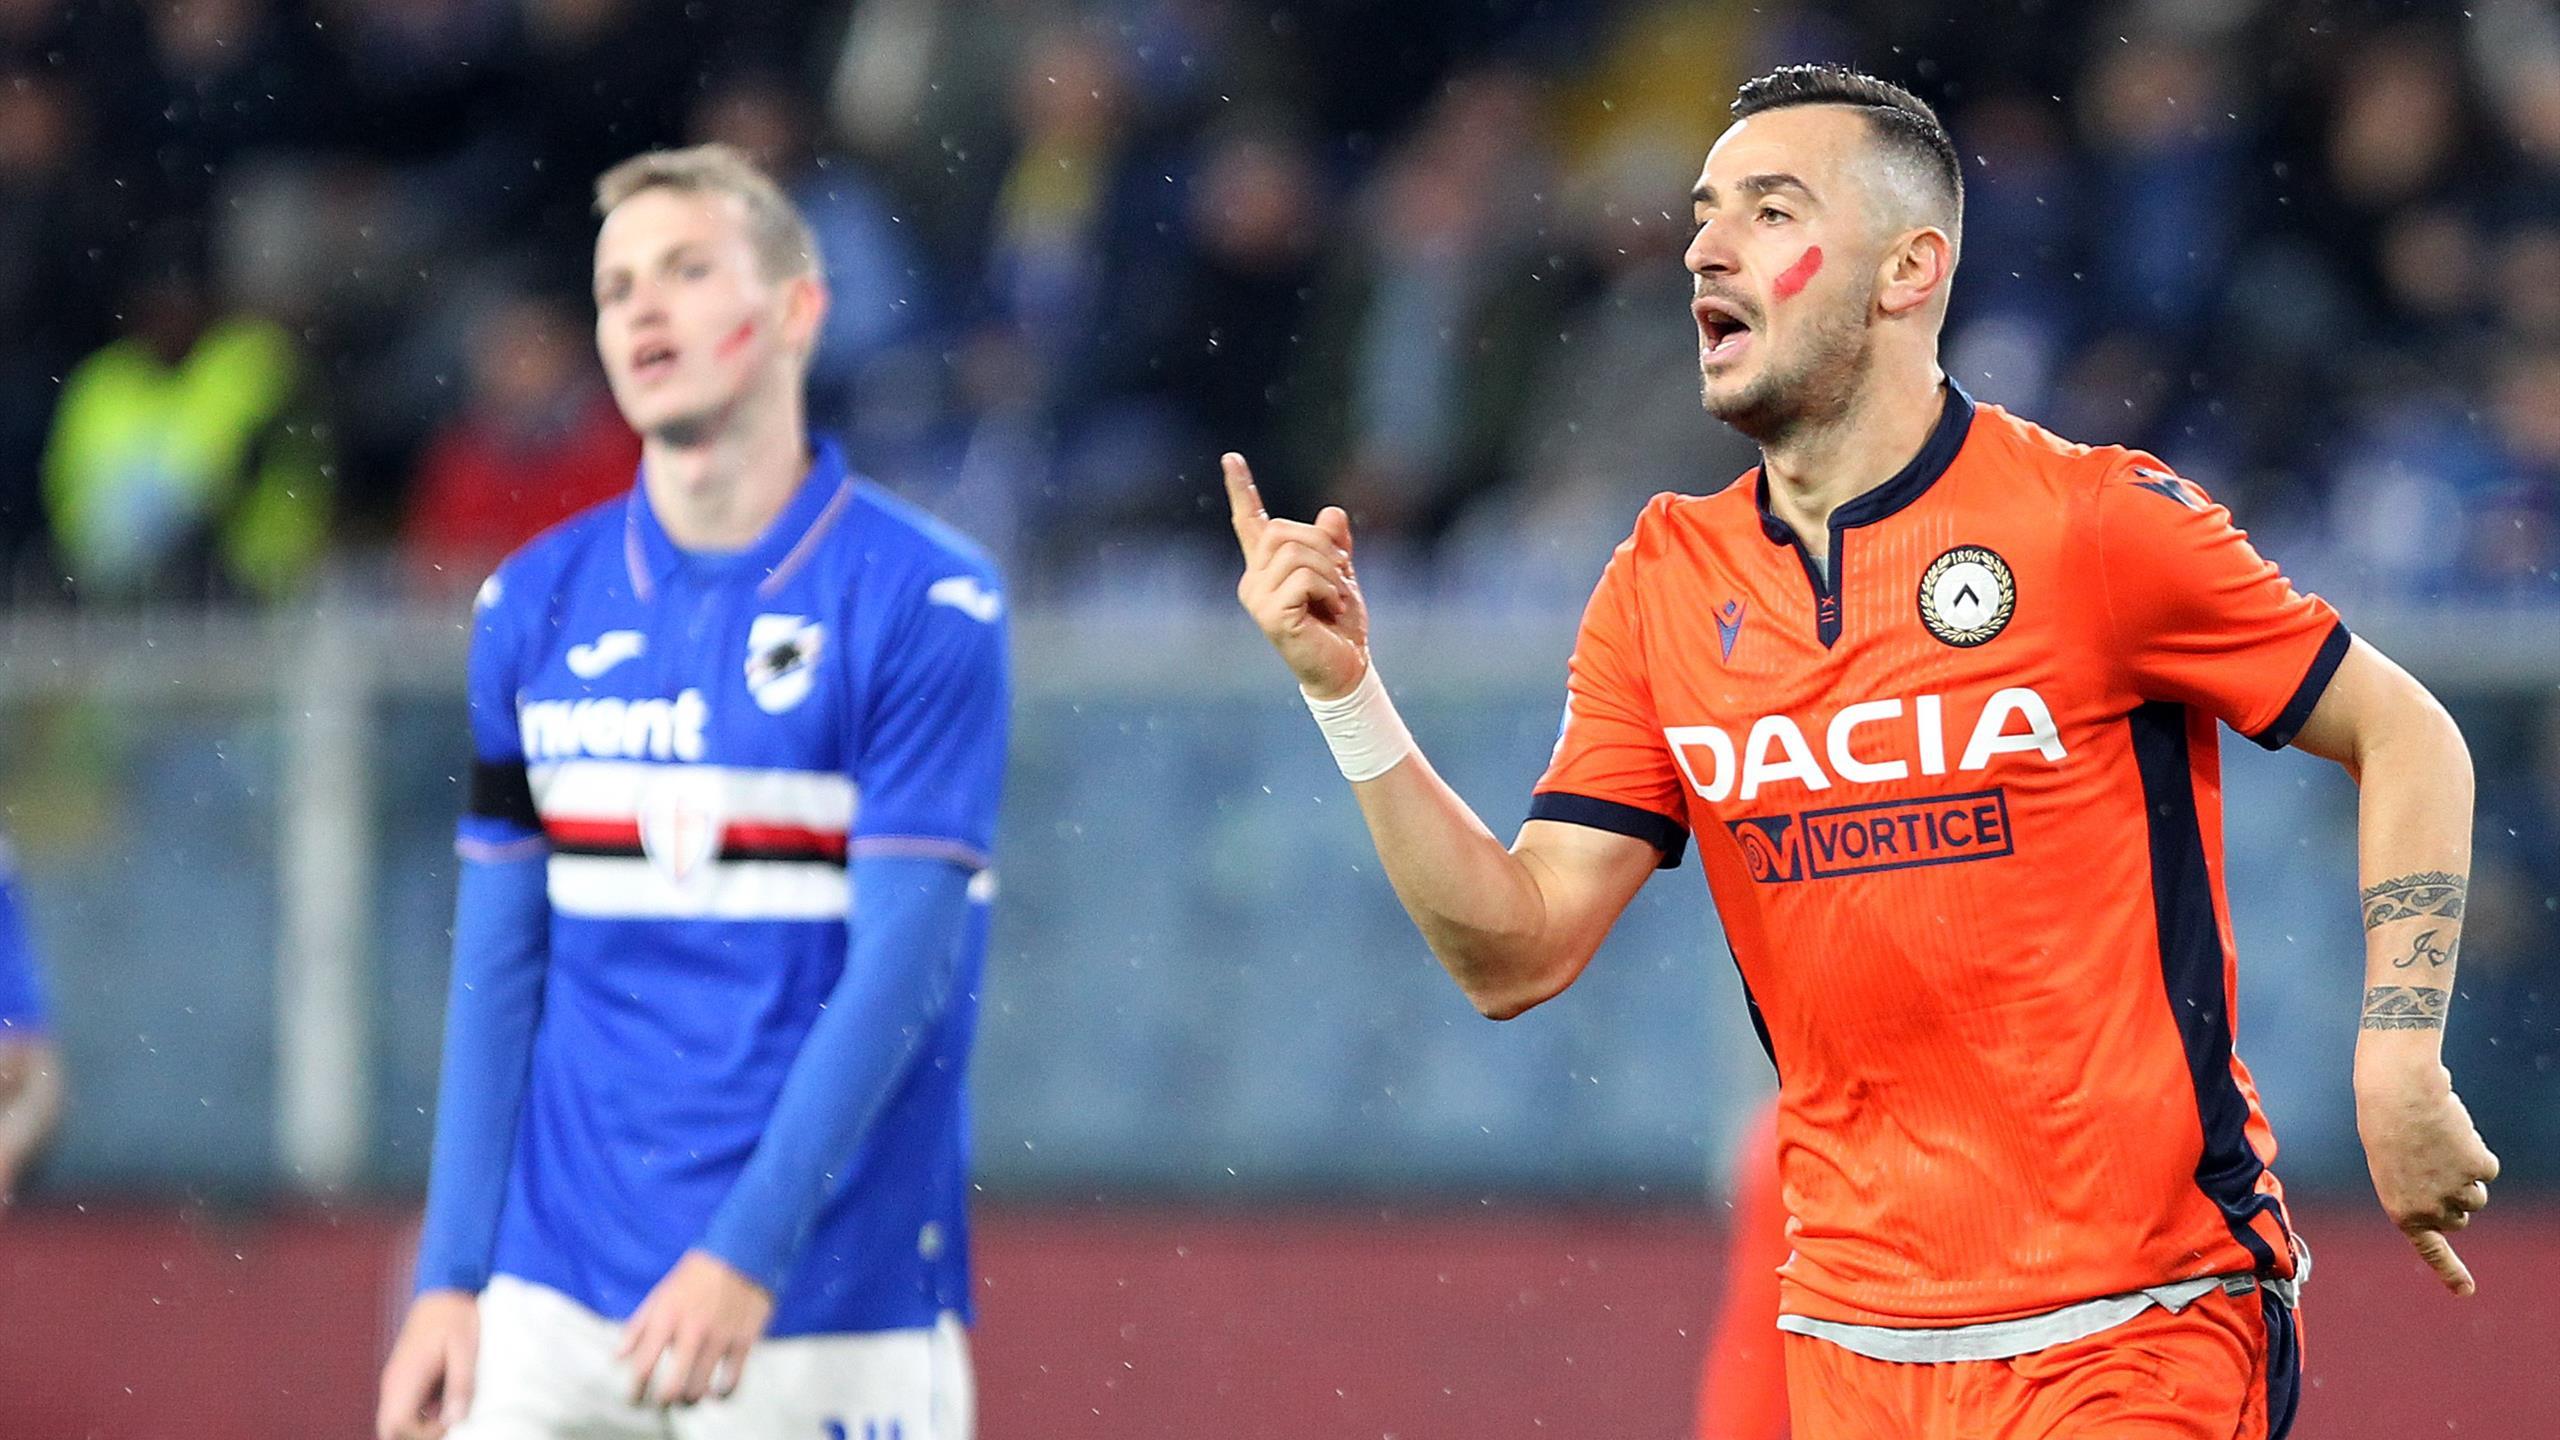 Le pagelle di Sampdoria-Udinese 2-1: Gabbiadini favoloso, Ramirez ...